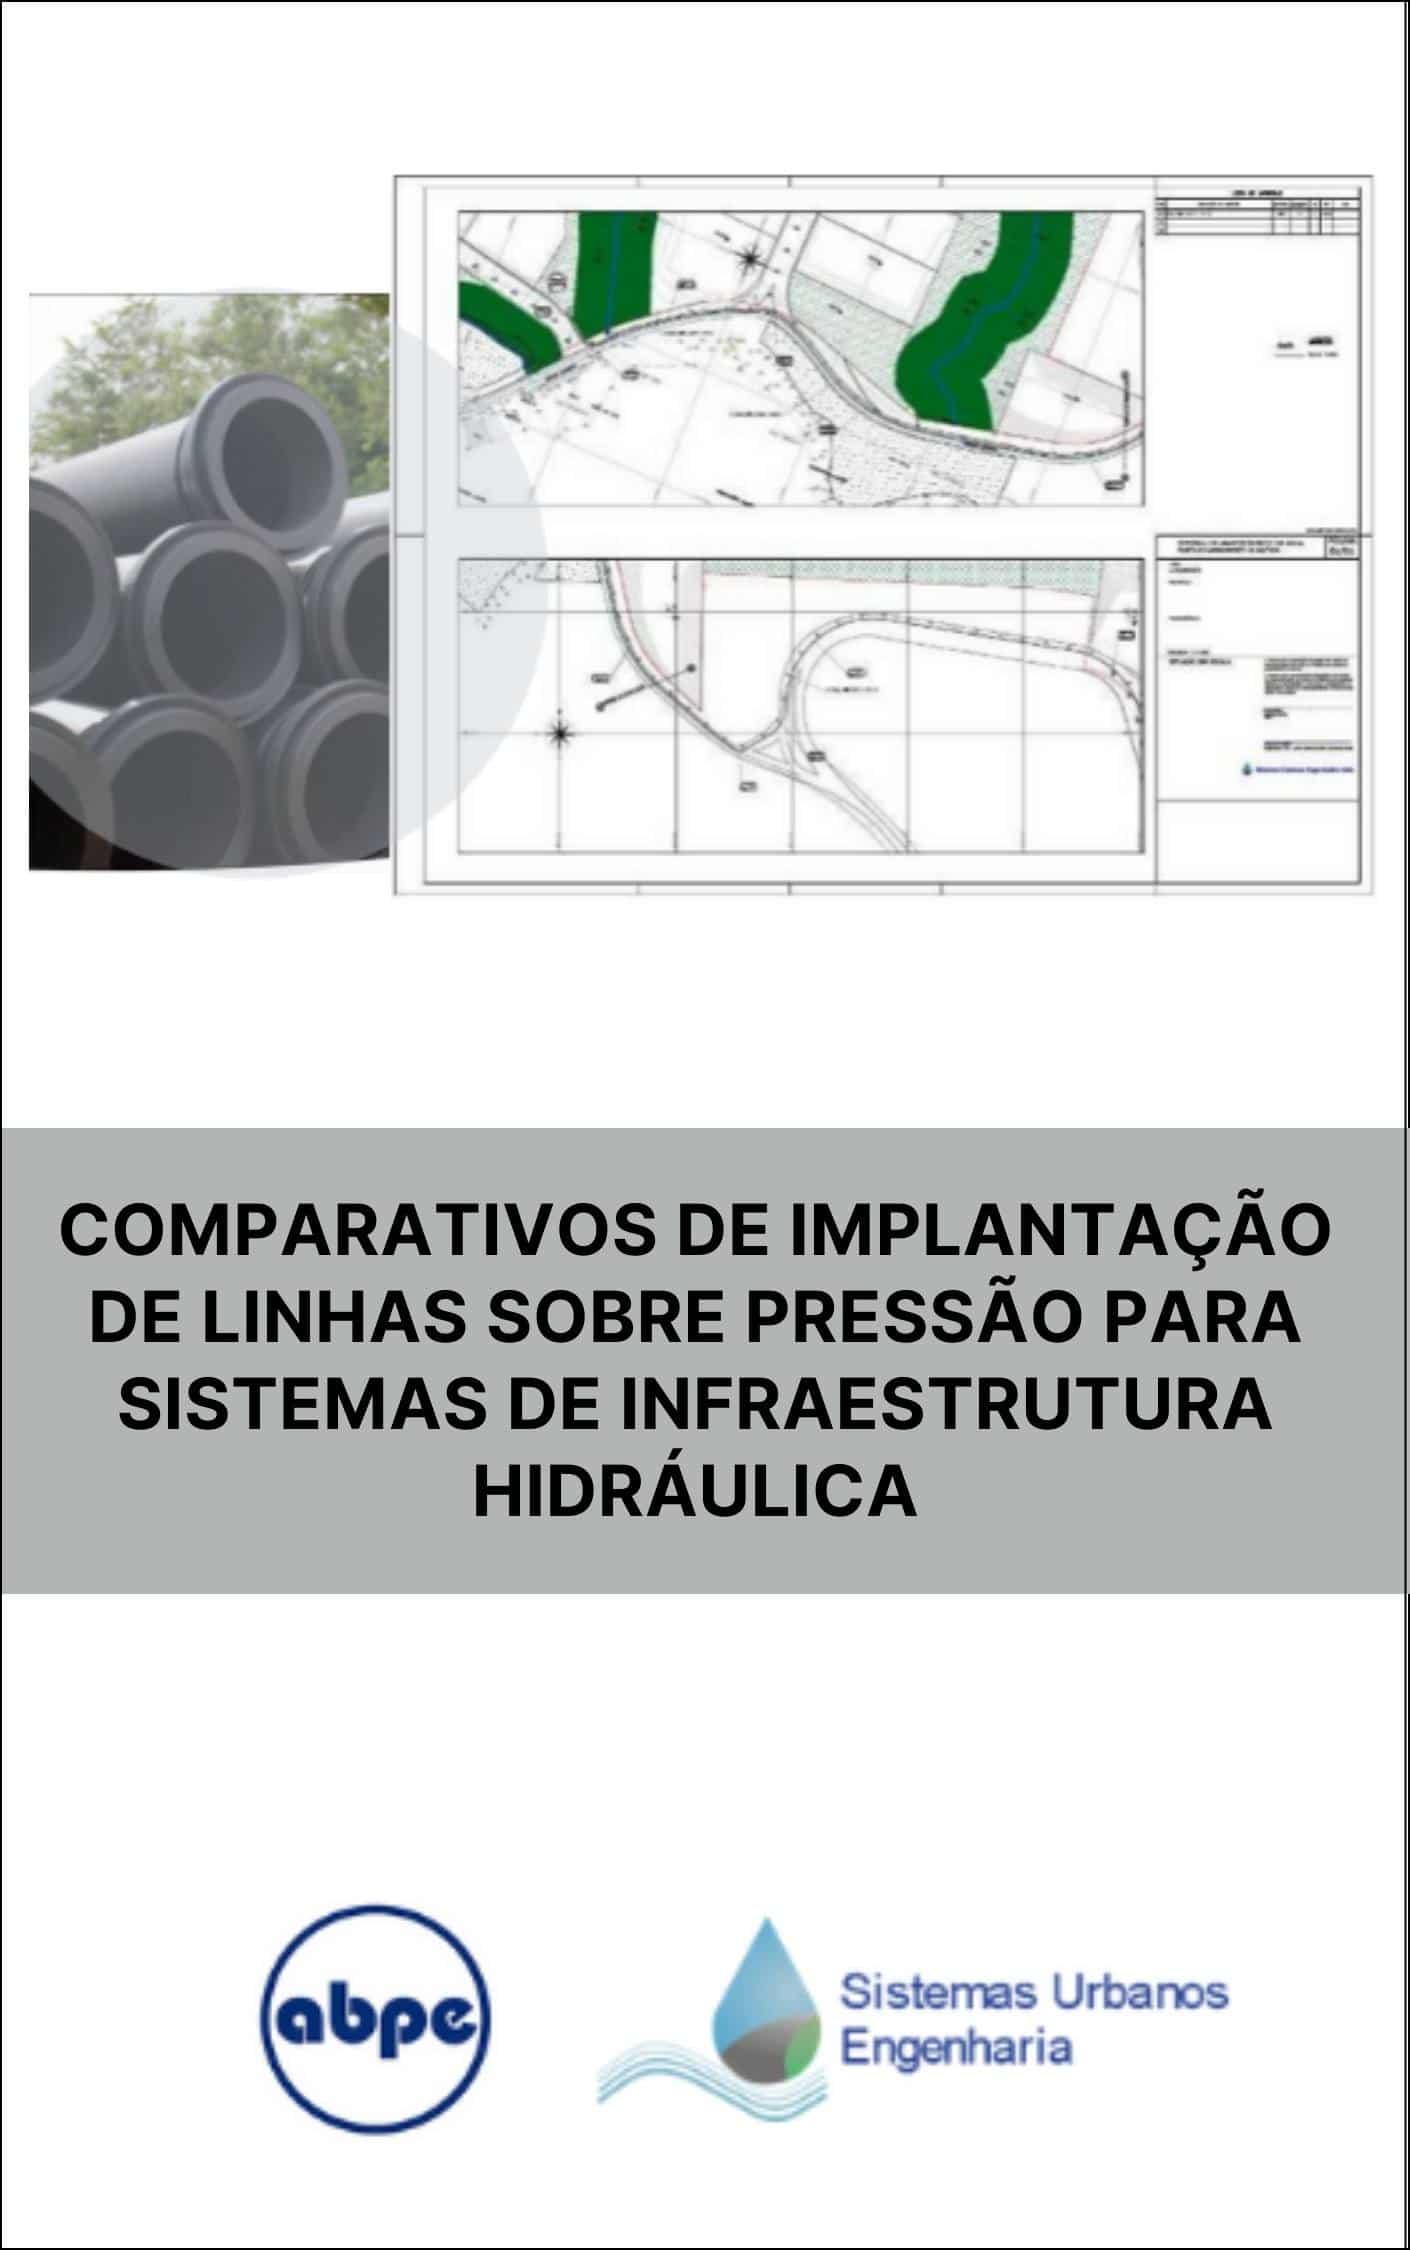 infraestrutura_hidraulica